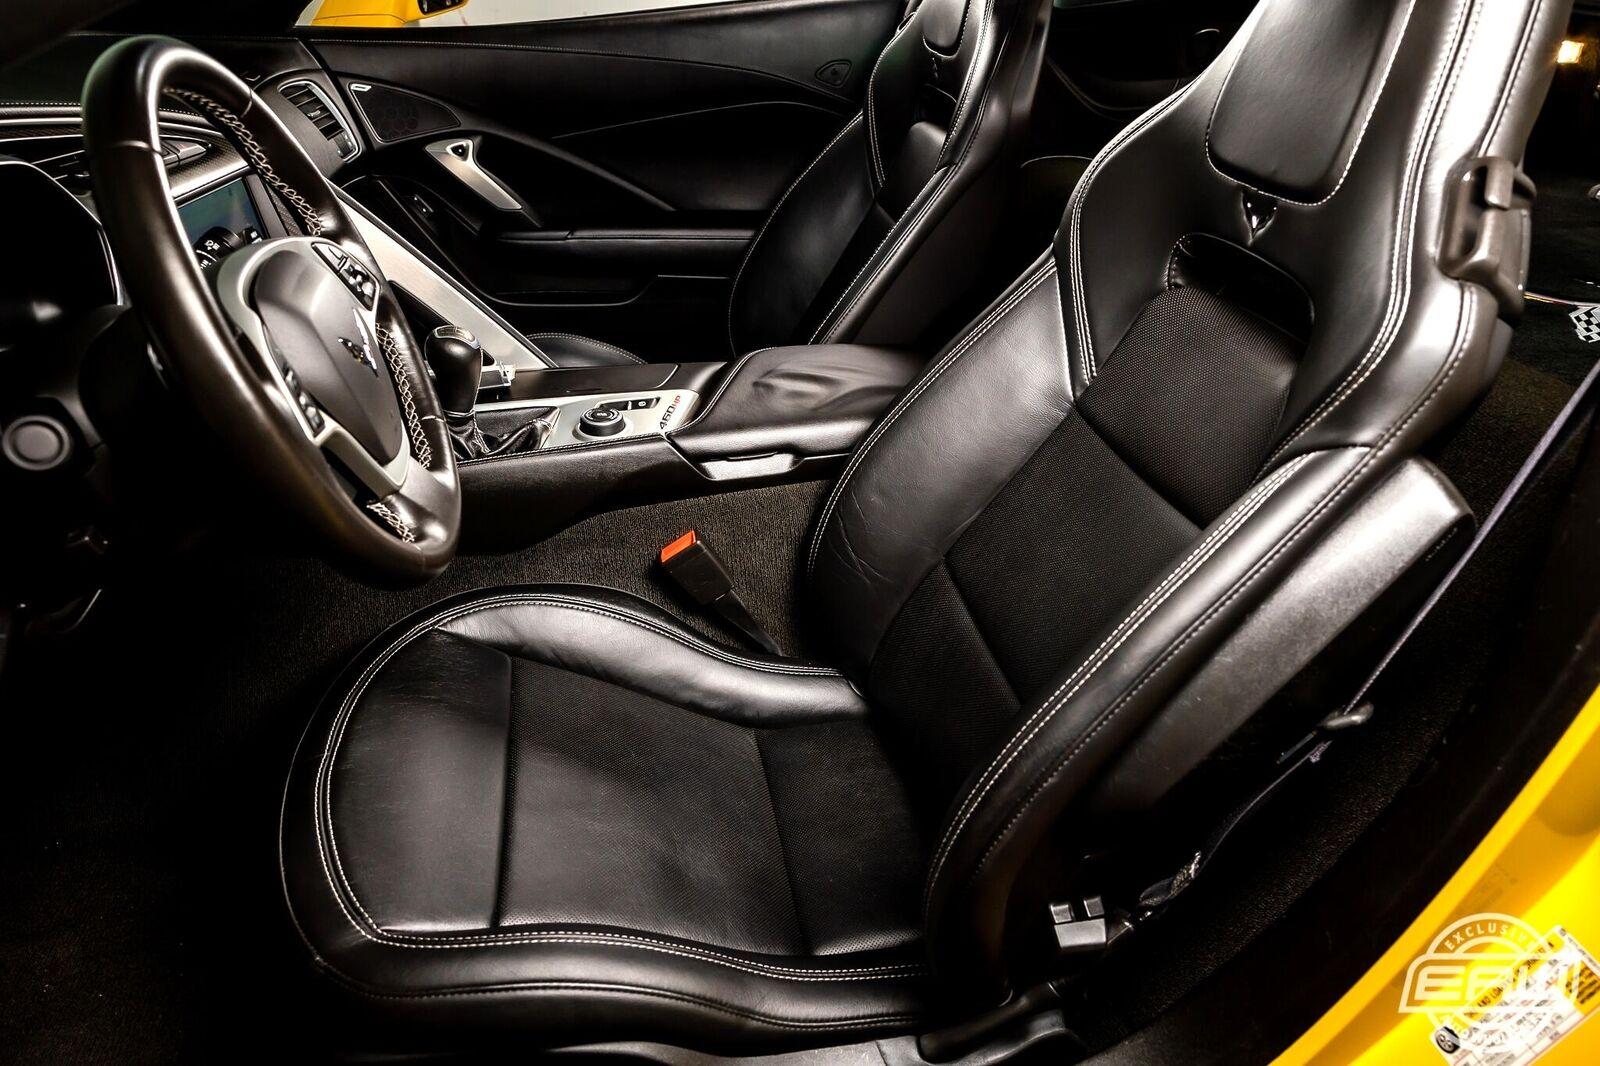 2014 Yellow Chevrolet Corvette Coupe 2LT   C7 Corvette Photo 5